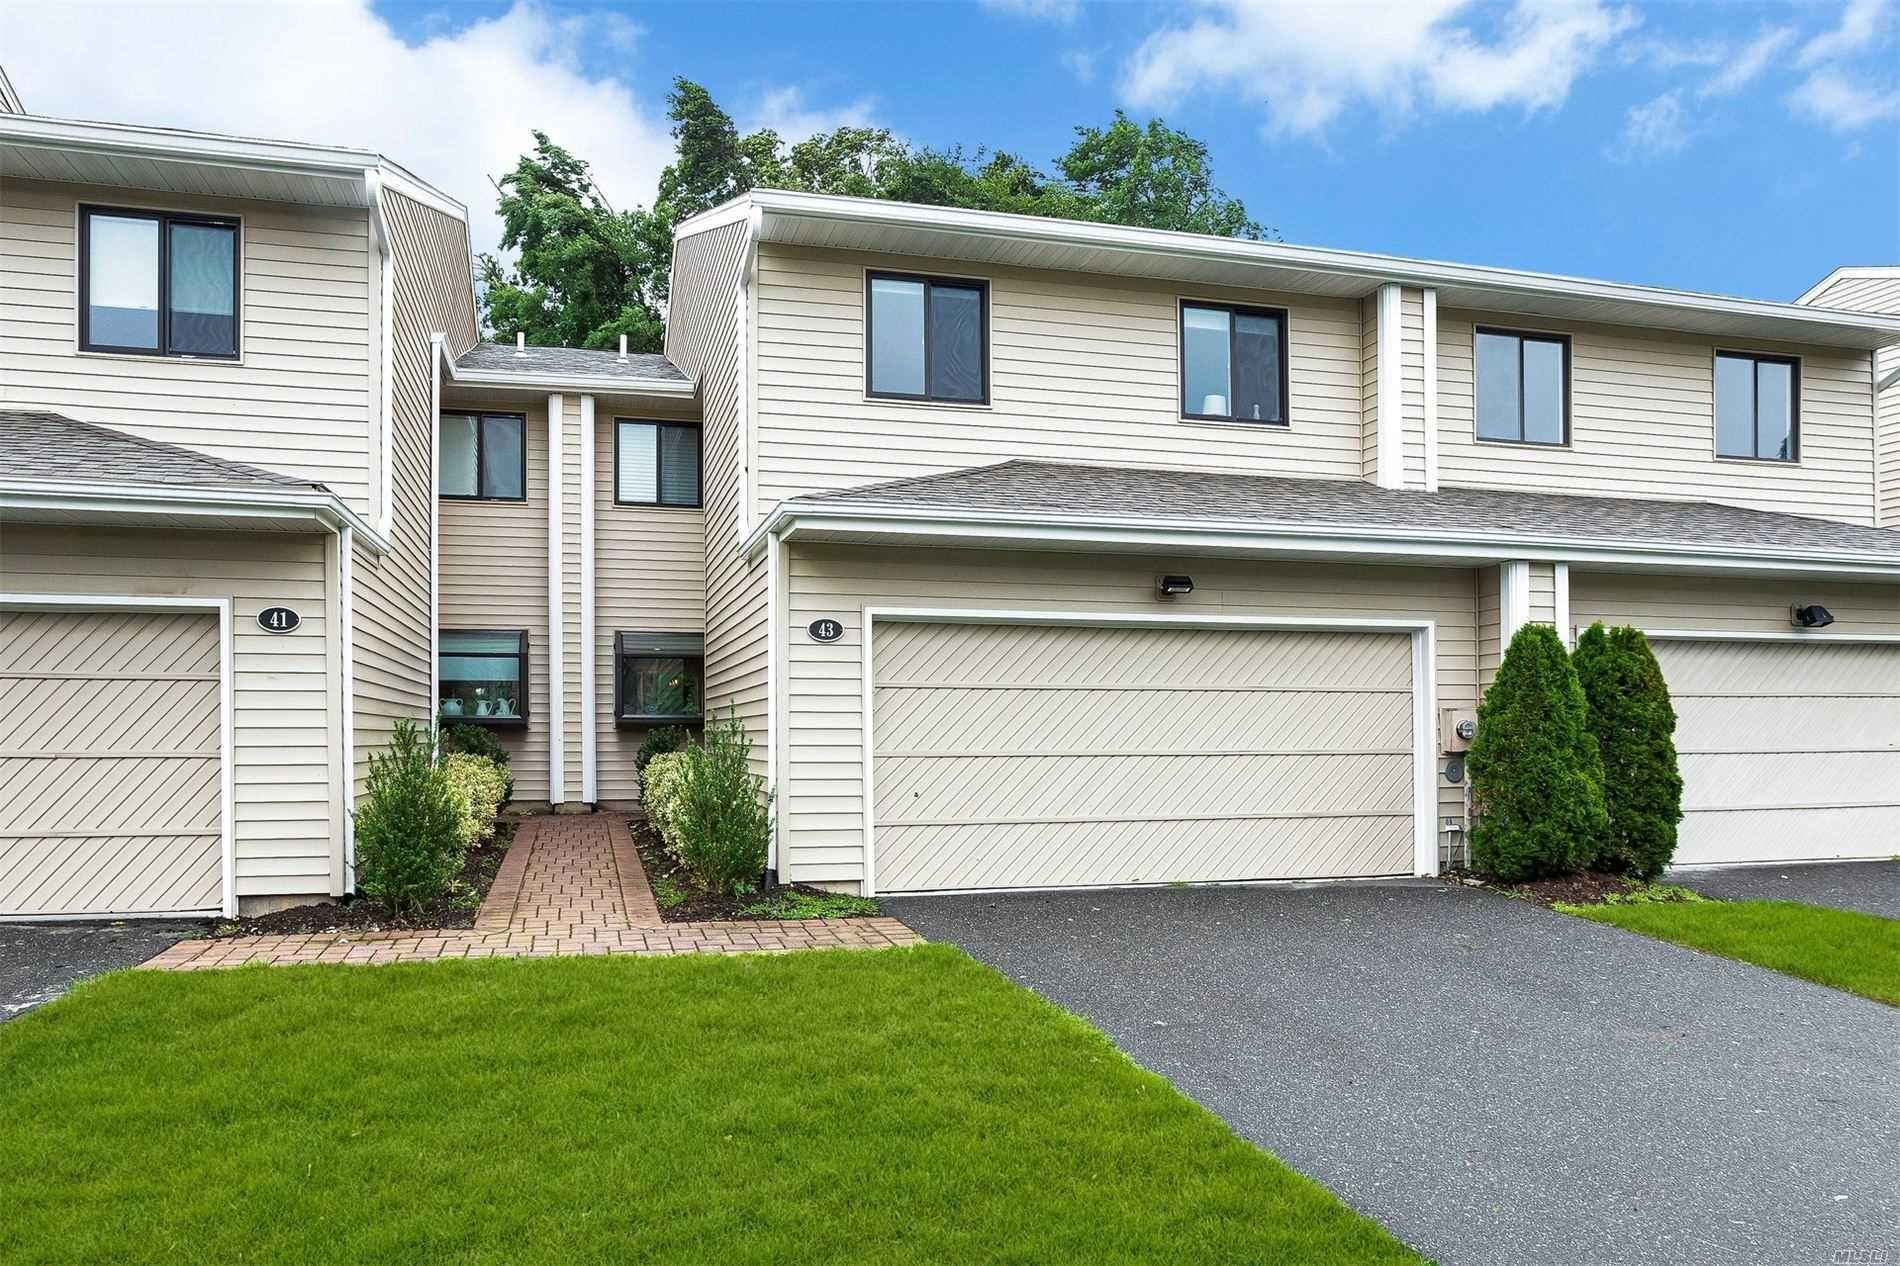 43 Pheasant Lane, Woodbury, NY 11797 - MLS#: 3239863